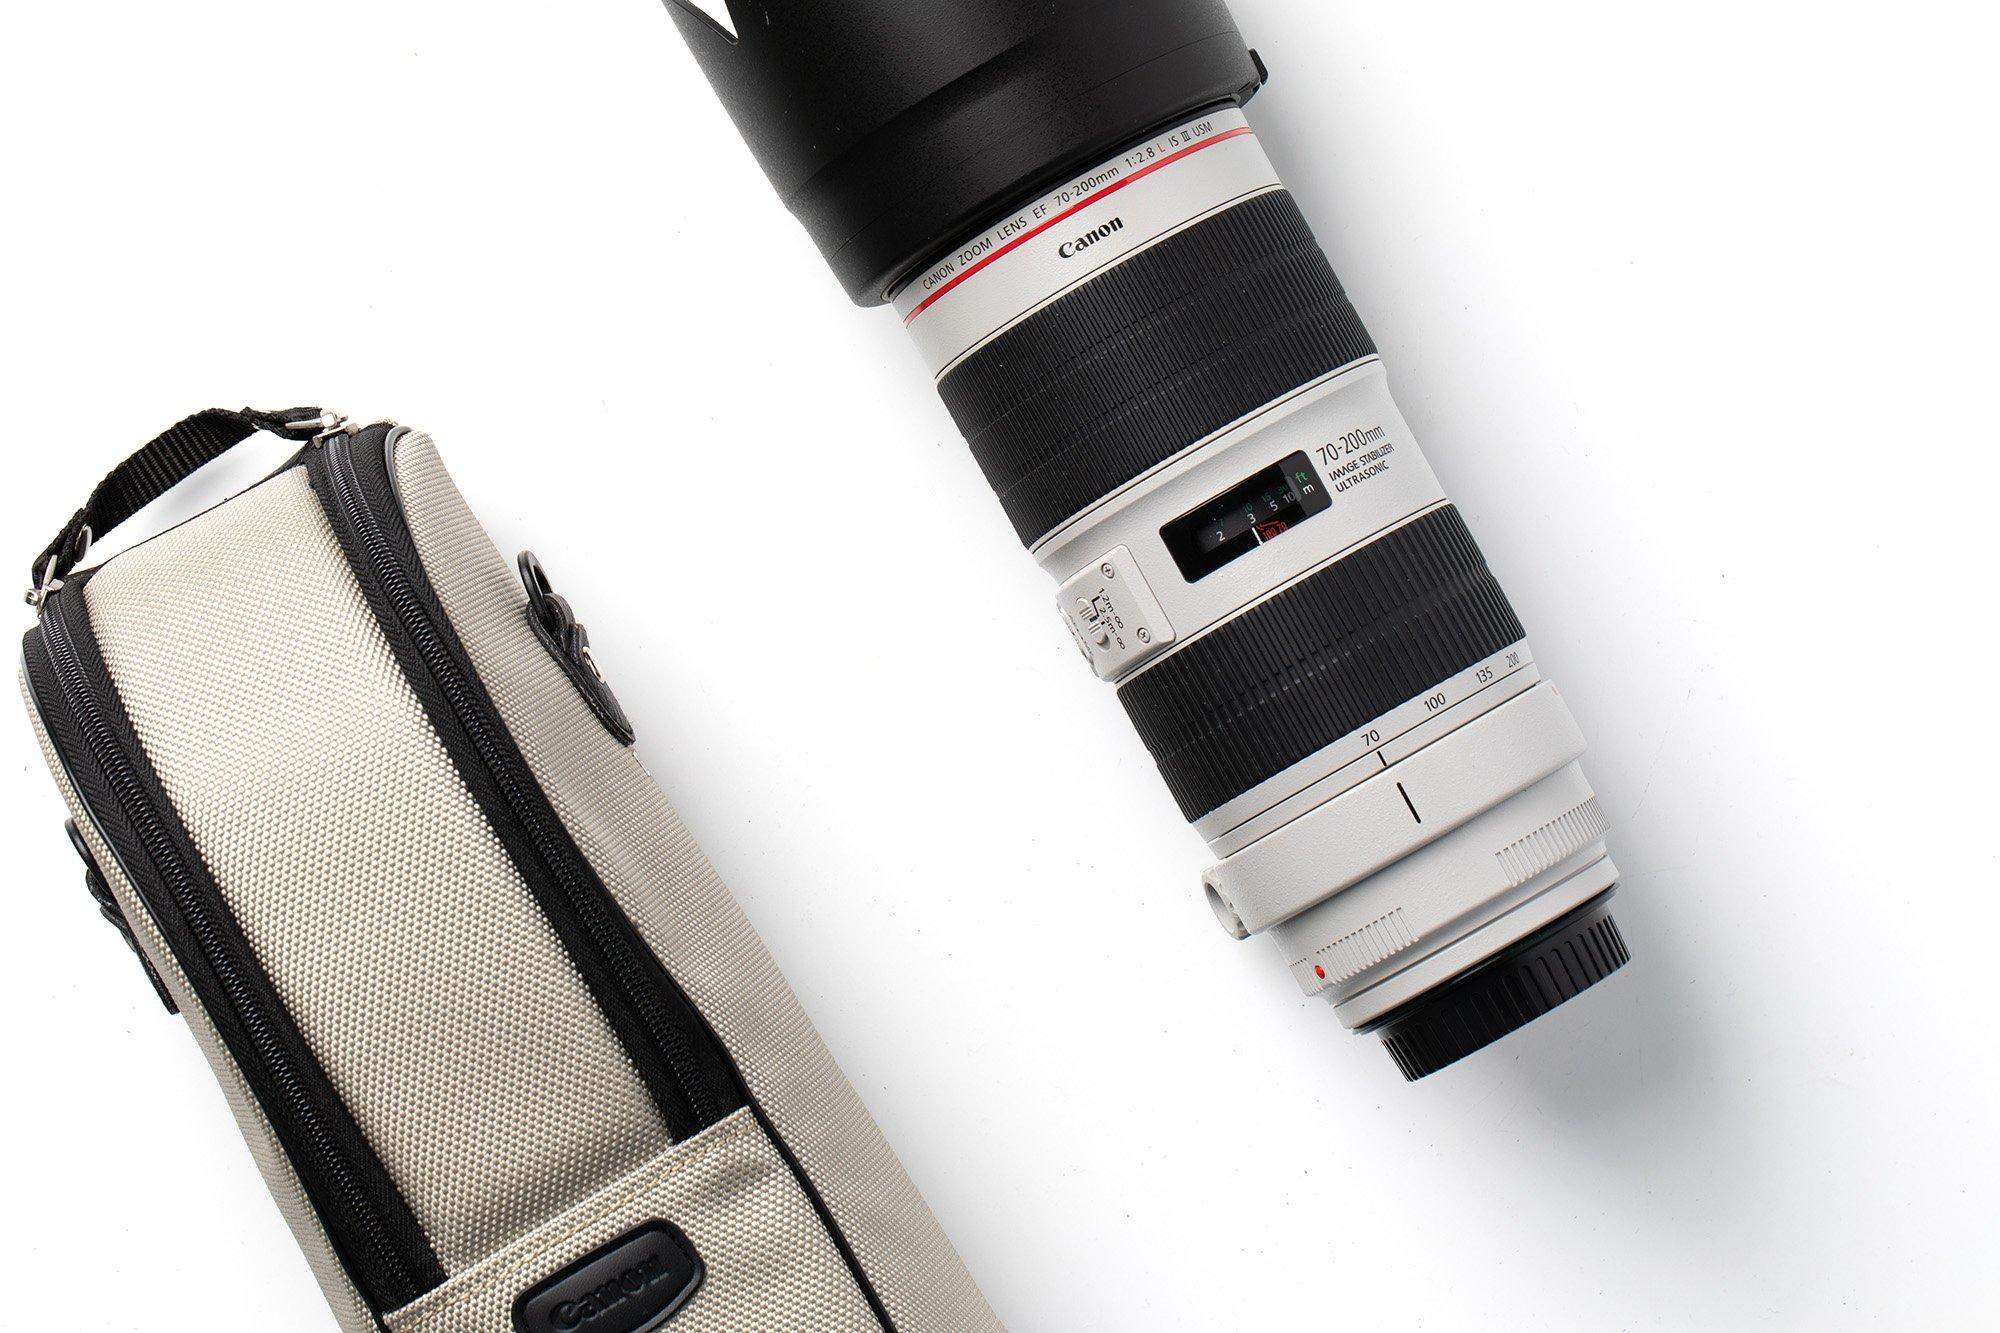 70-200mm Shootout: Nikon Takes the Crown, Sony G Master Needs Work